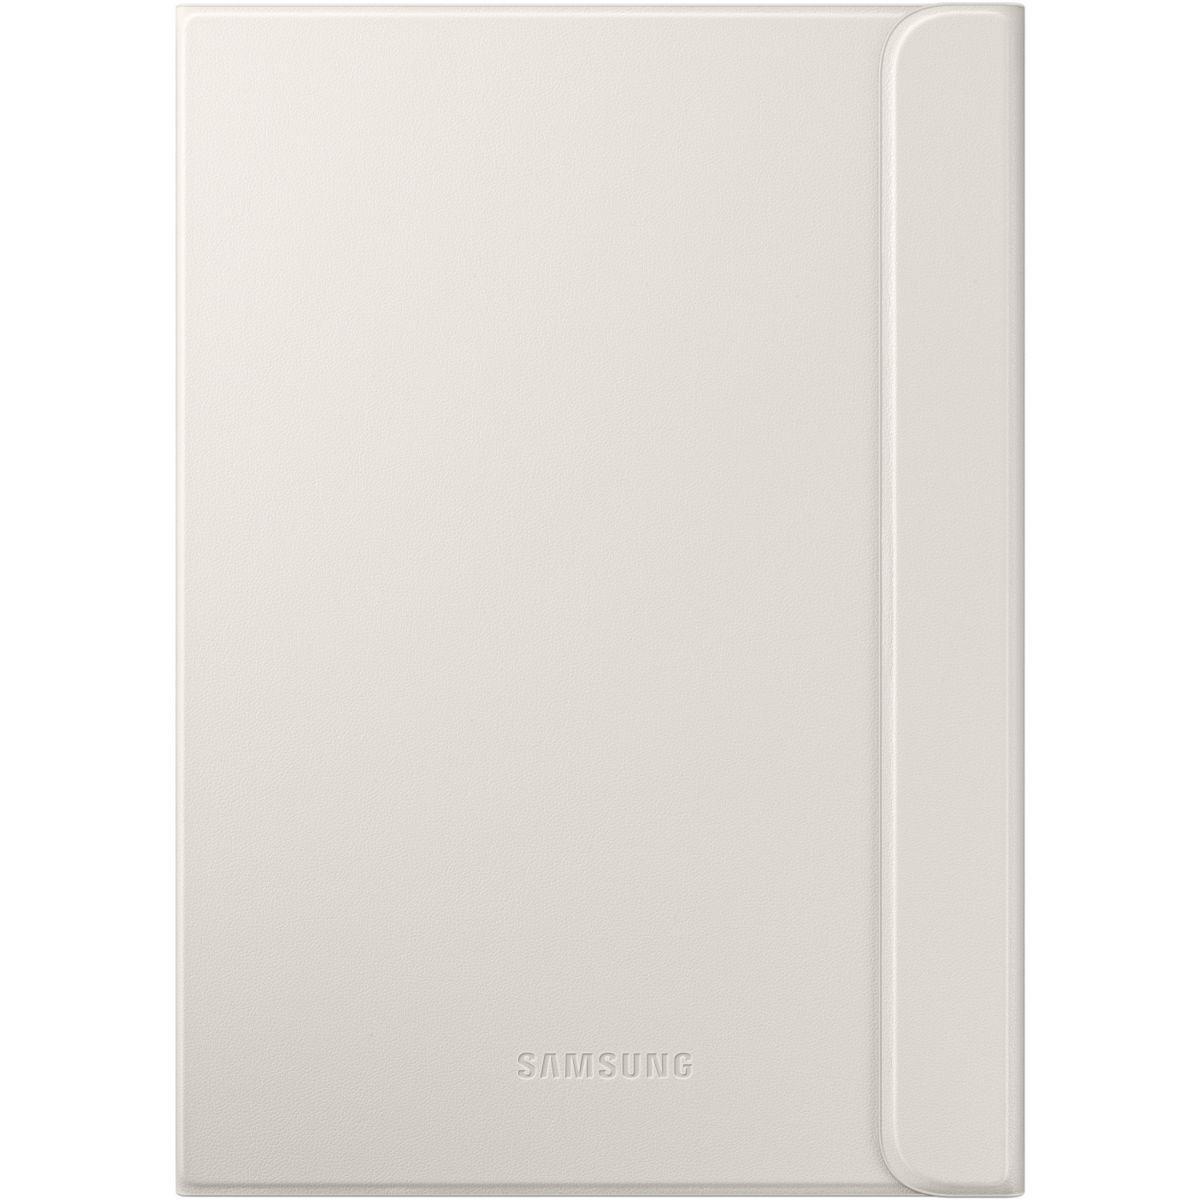 Etui tablette samsung book cover tab s2 9.7'' blanc - livraison offerte : code premium (photo)